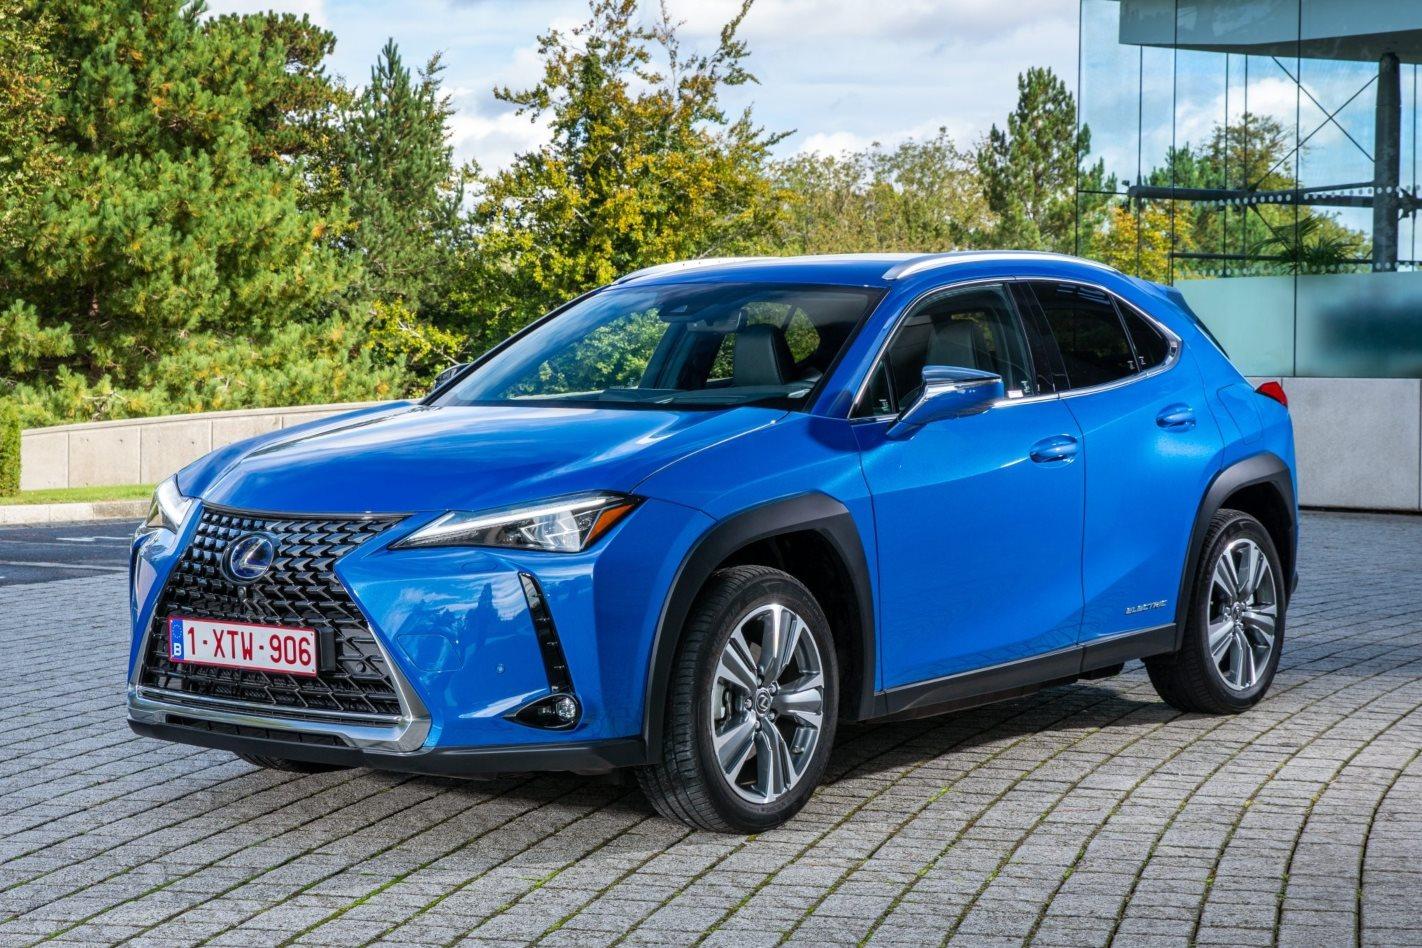 2021 Lexus Ux 300e Confirmed